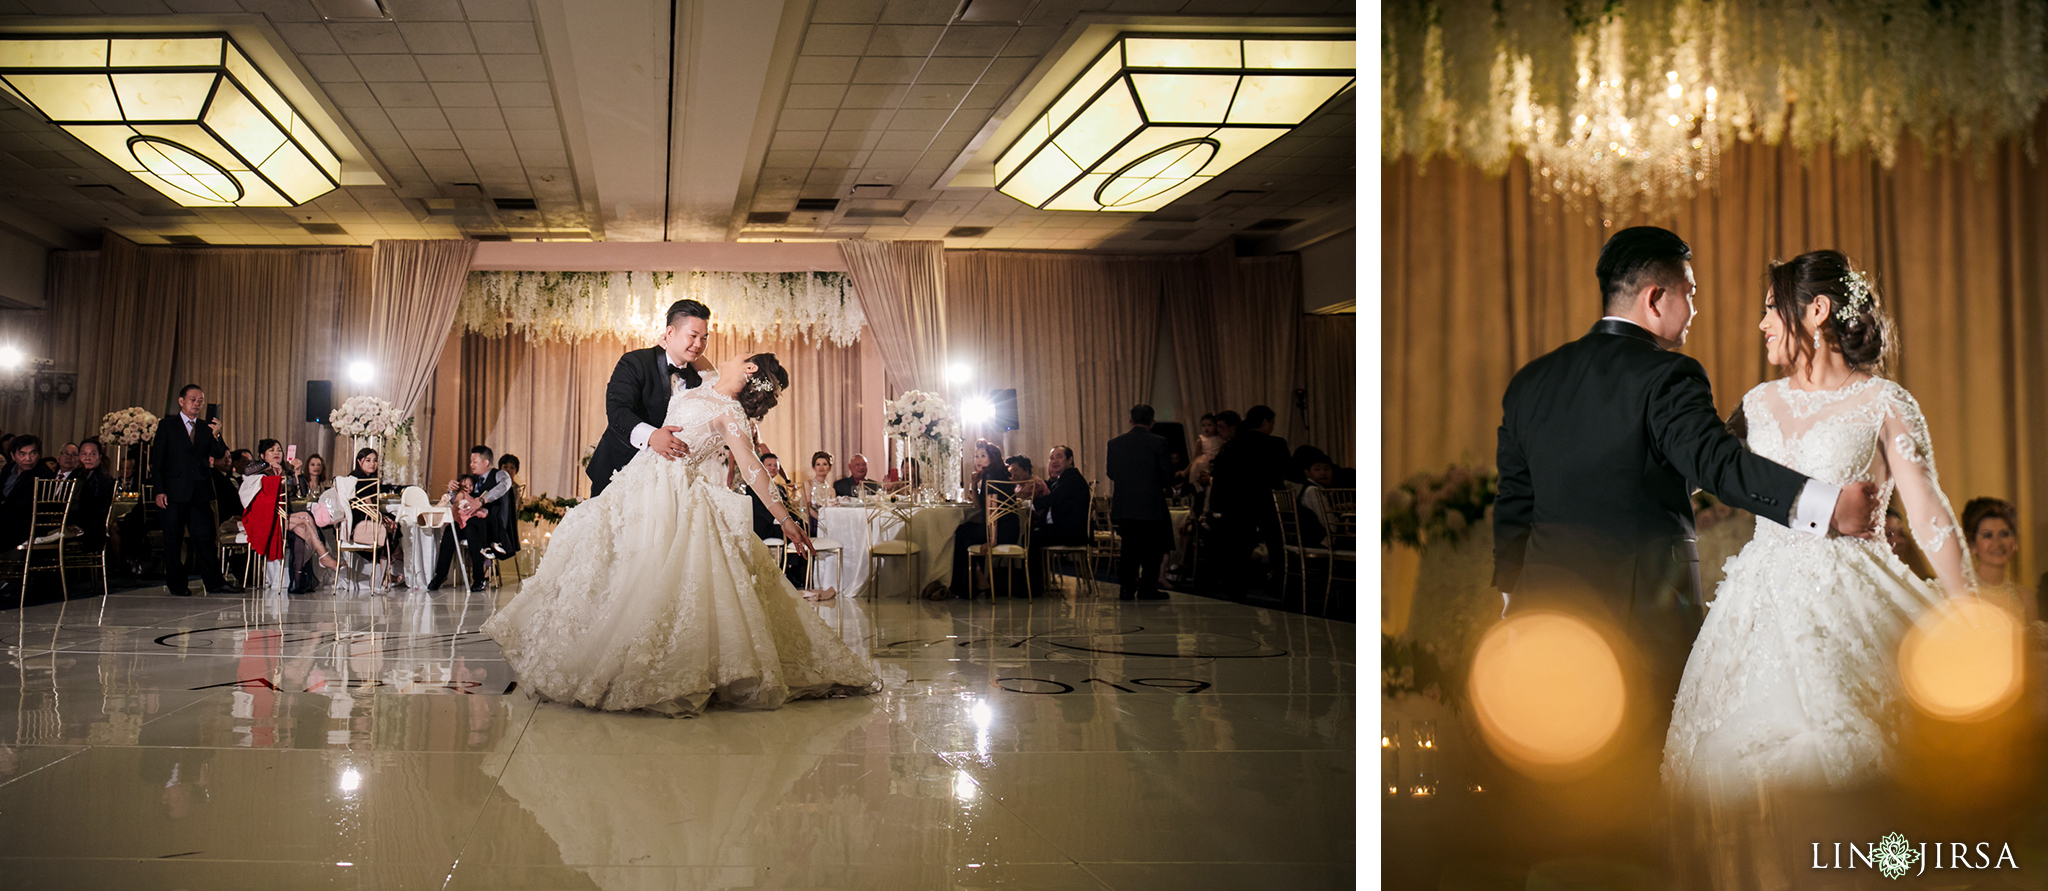 28 The Newport Beach Marriott Hotel Wedding Photography